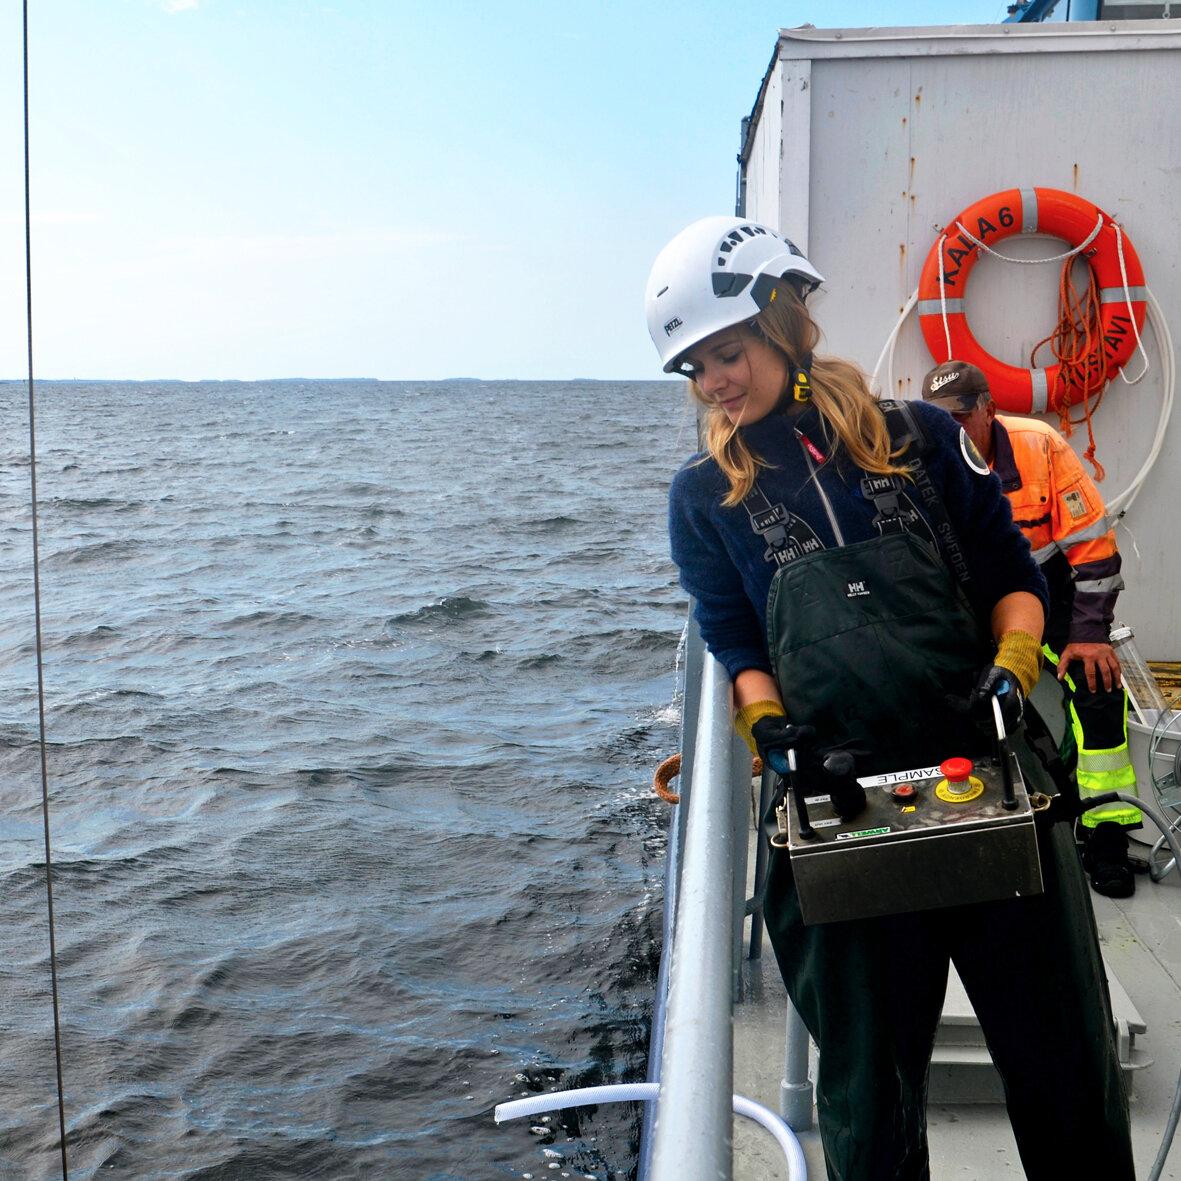 Green Talk: Pinja Näkki - Pinja Näkki is a biologist working with marine litter issues, marine litter education and public outreach.